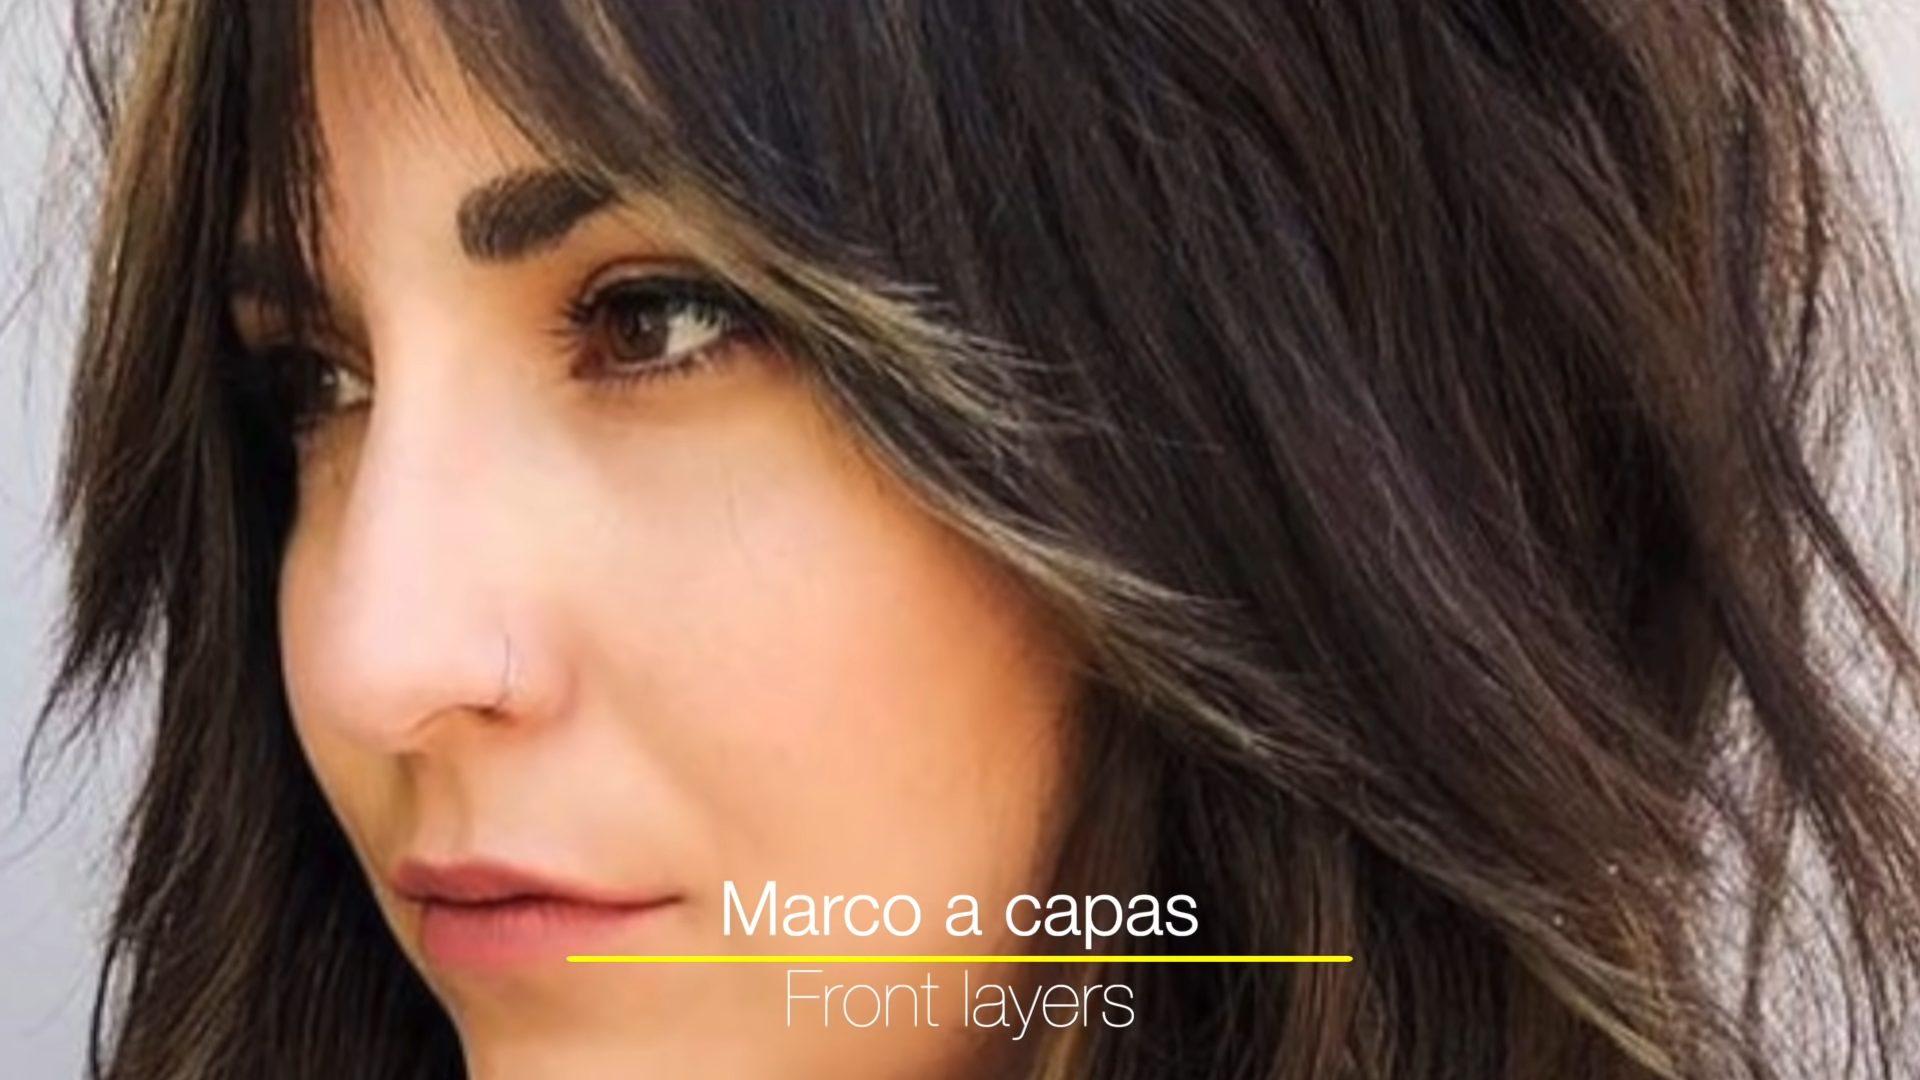 Marco a capas